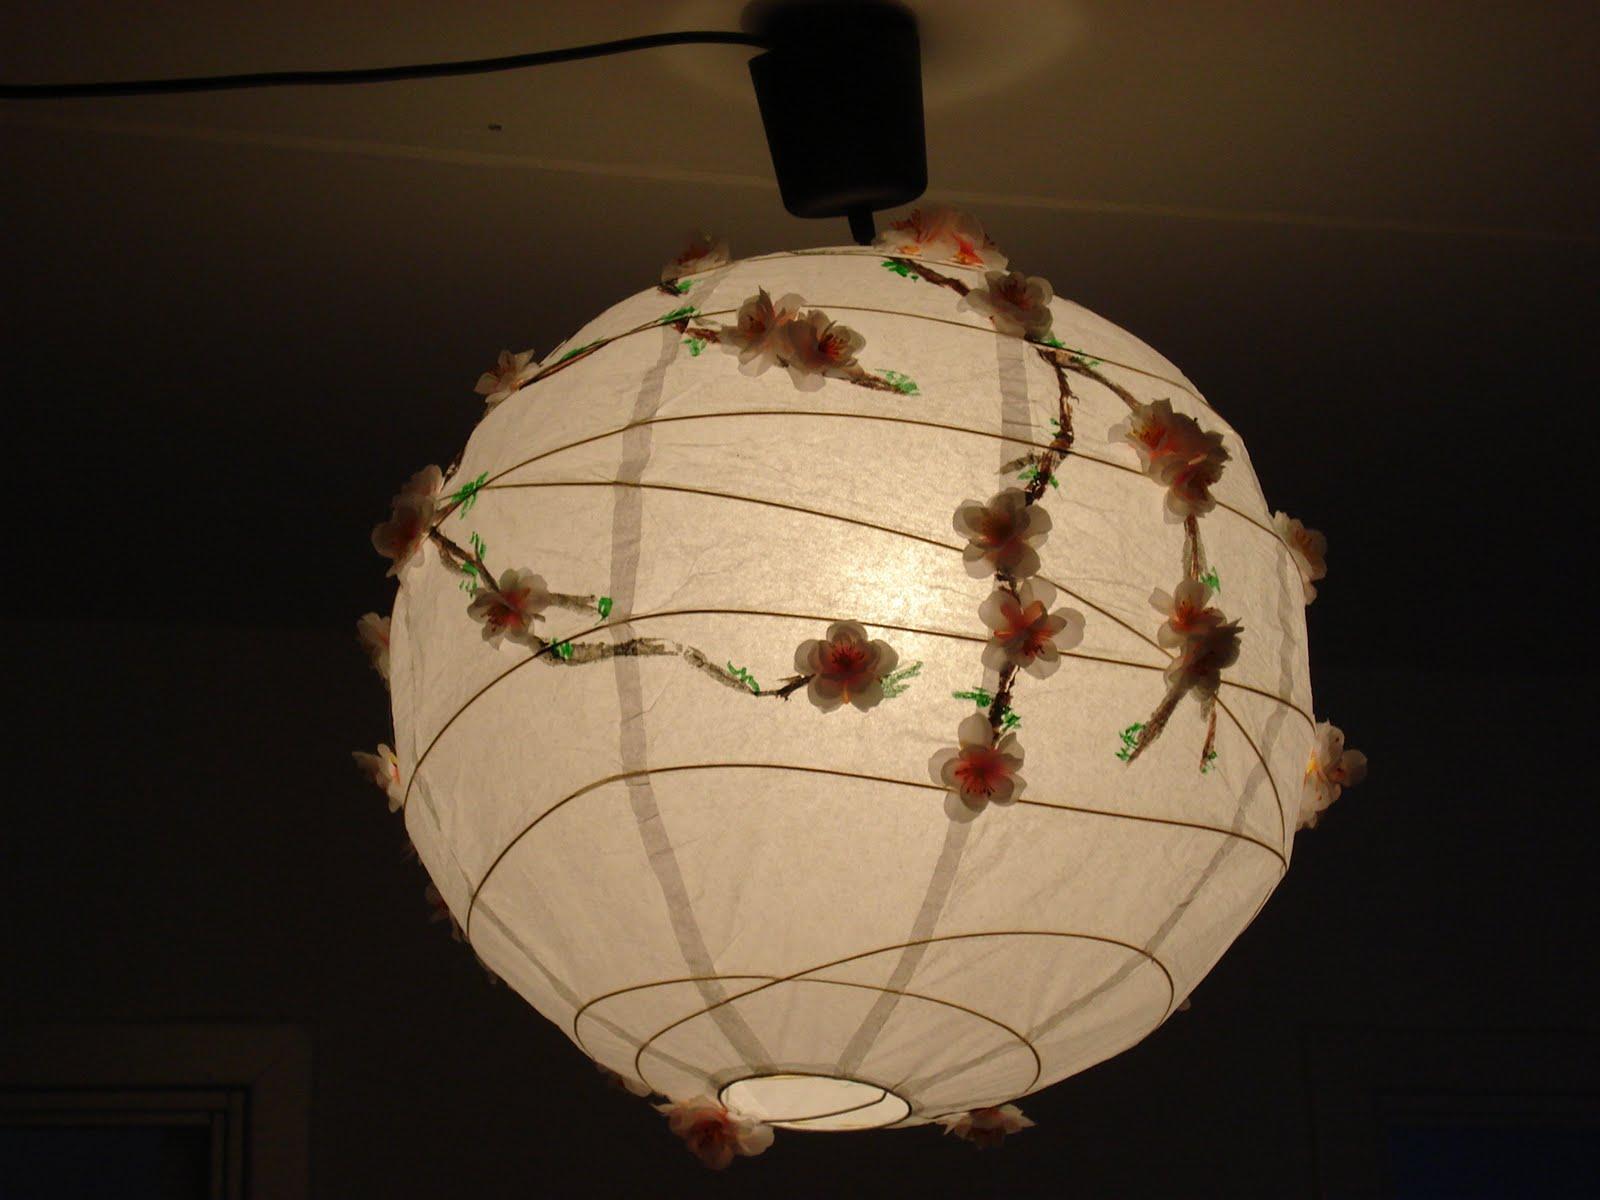 Wohnzimmer Mit Ikea Einrichten ~ Sakura lamp  IKEA Hackers  IKEA Hackers